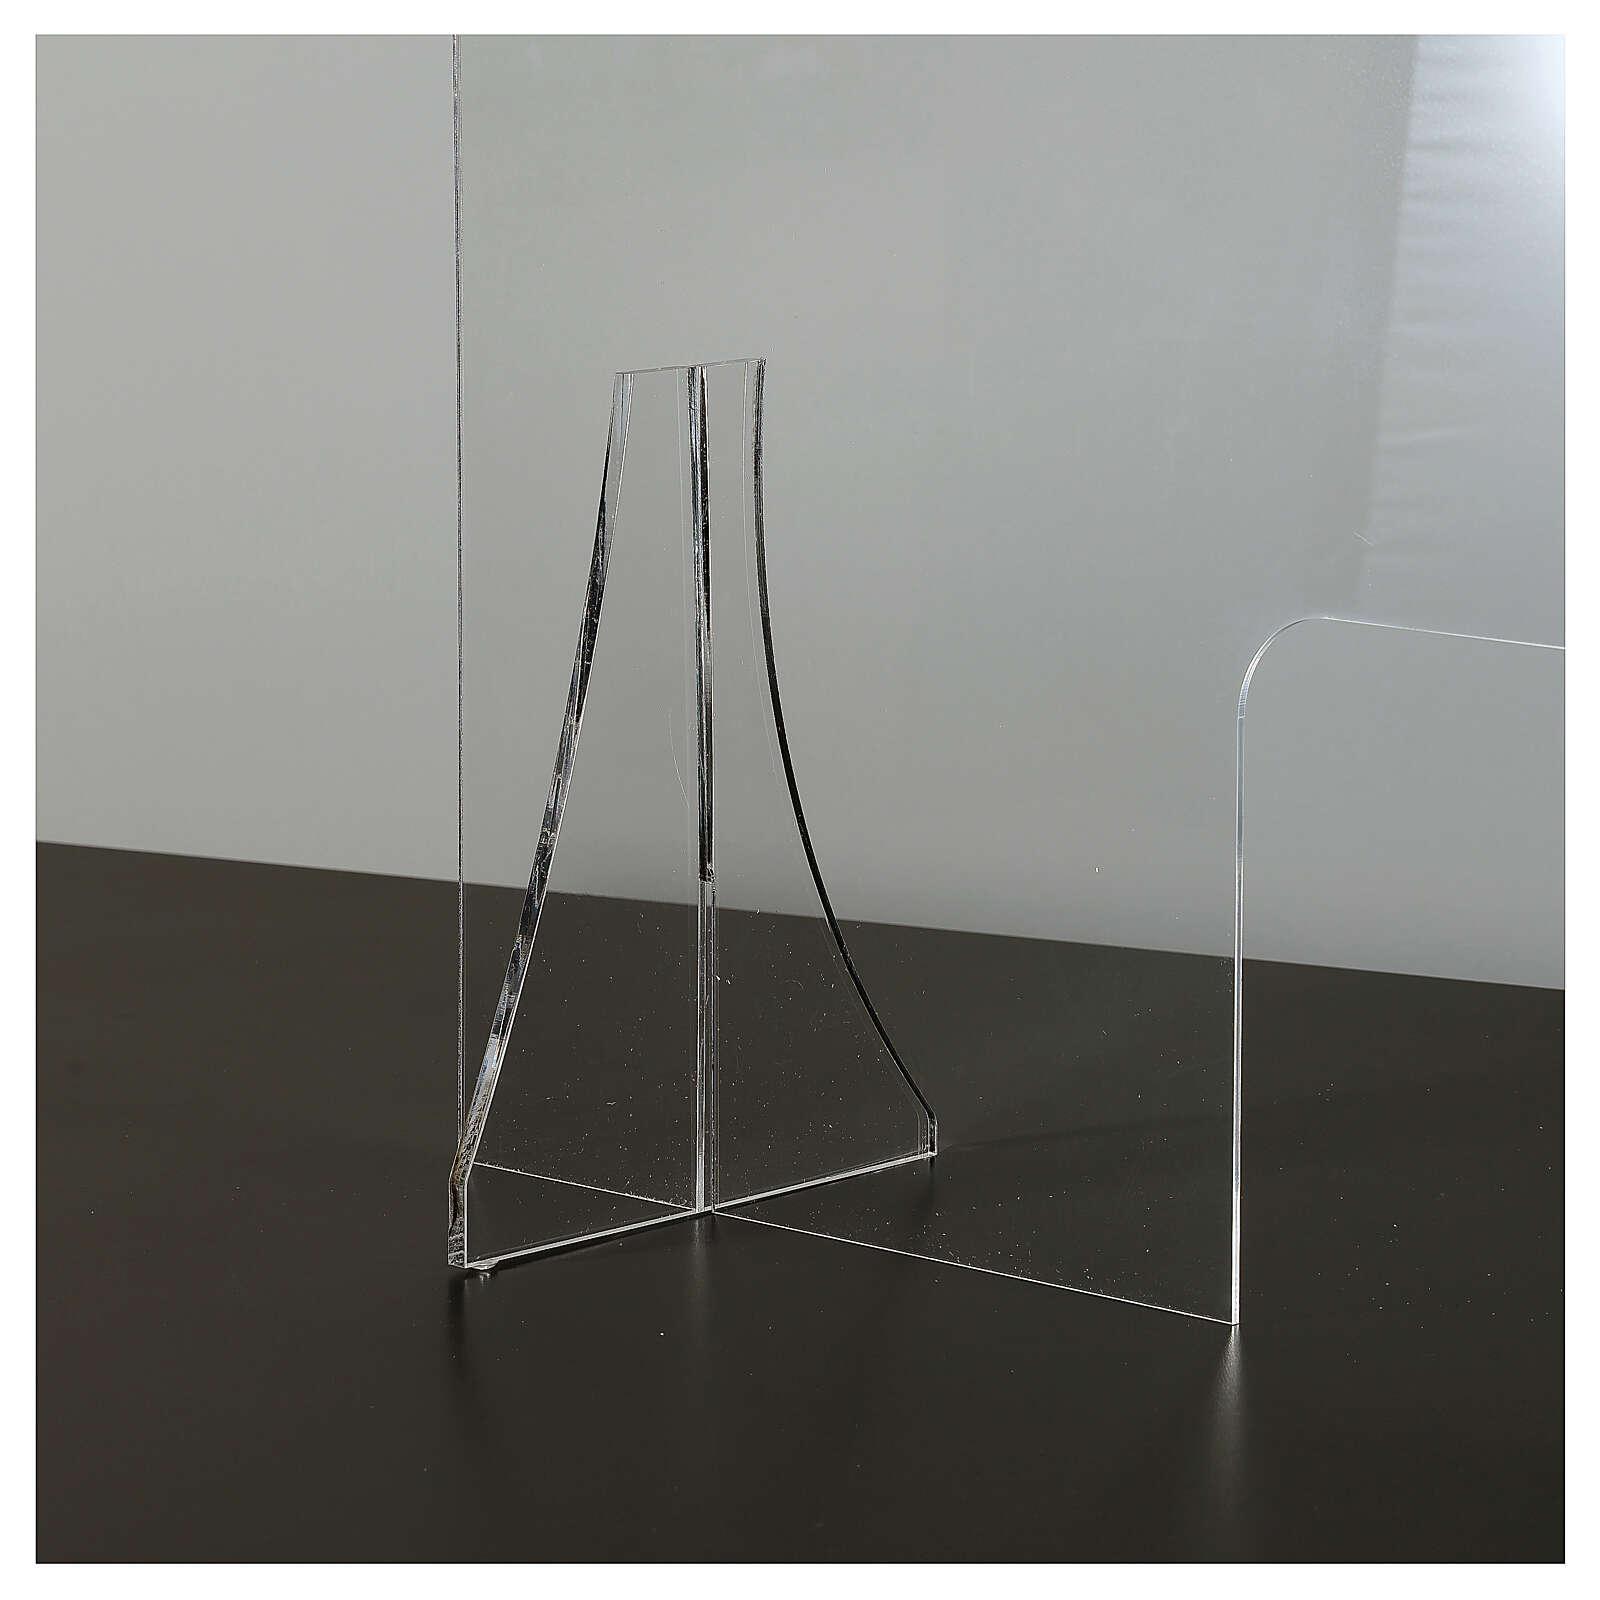 Plexiglas-Schutzwand 65x100 cm, 8 mm dick 3